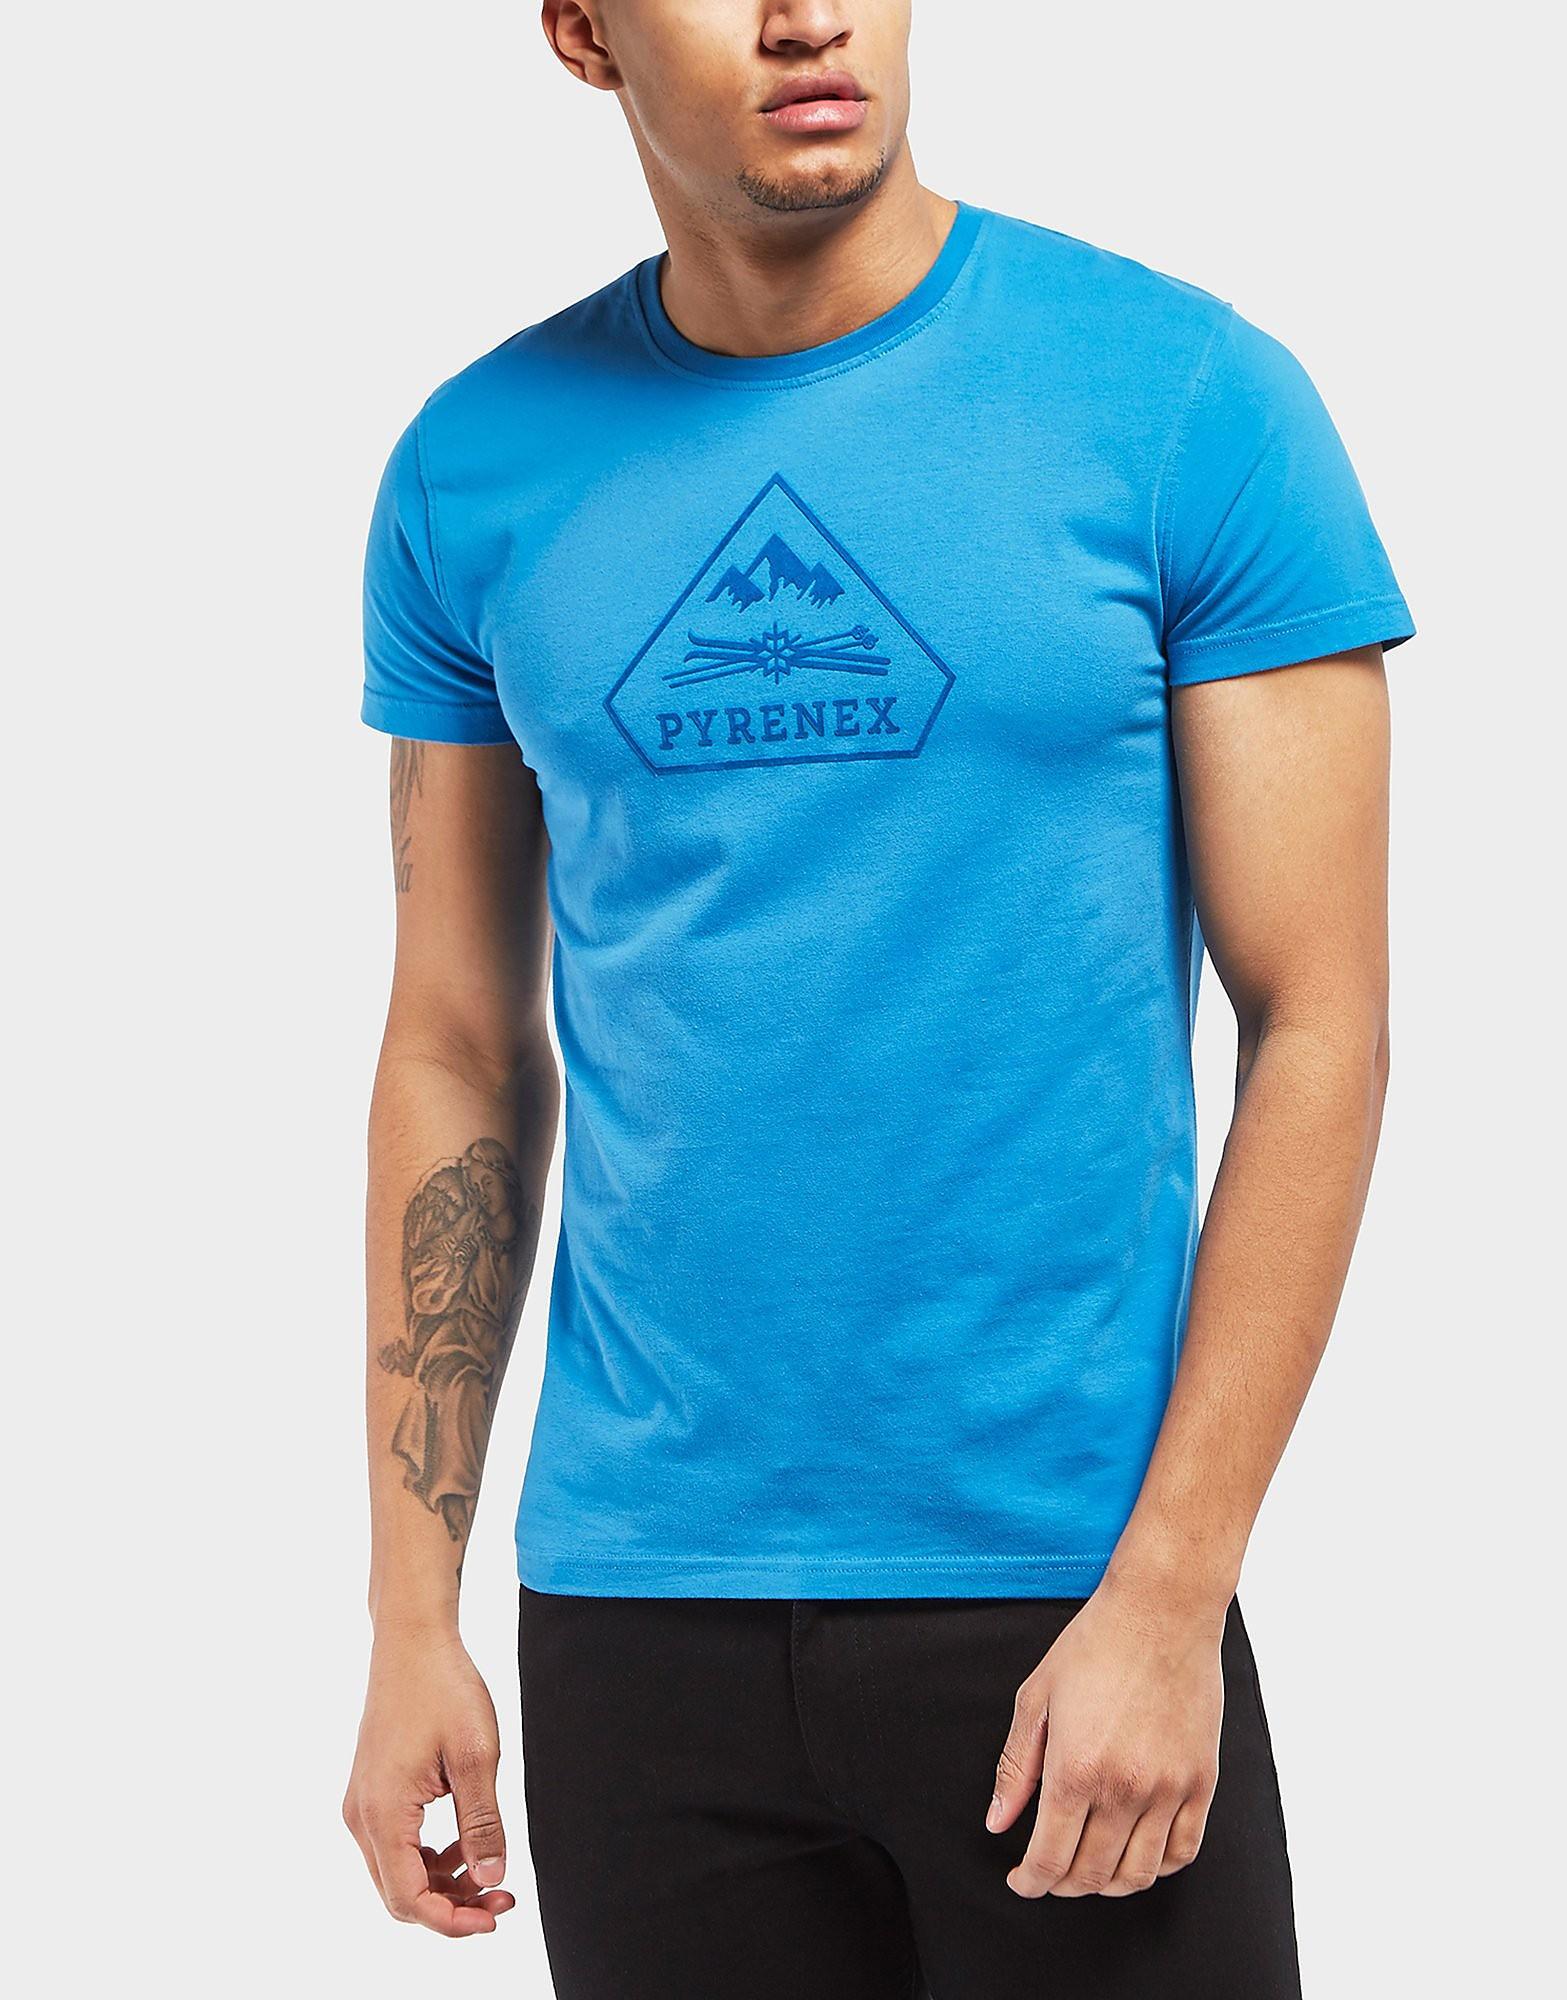 Pyrenex Erwin Short Sleeve T-Shirt